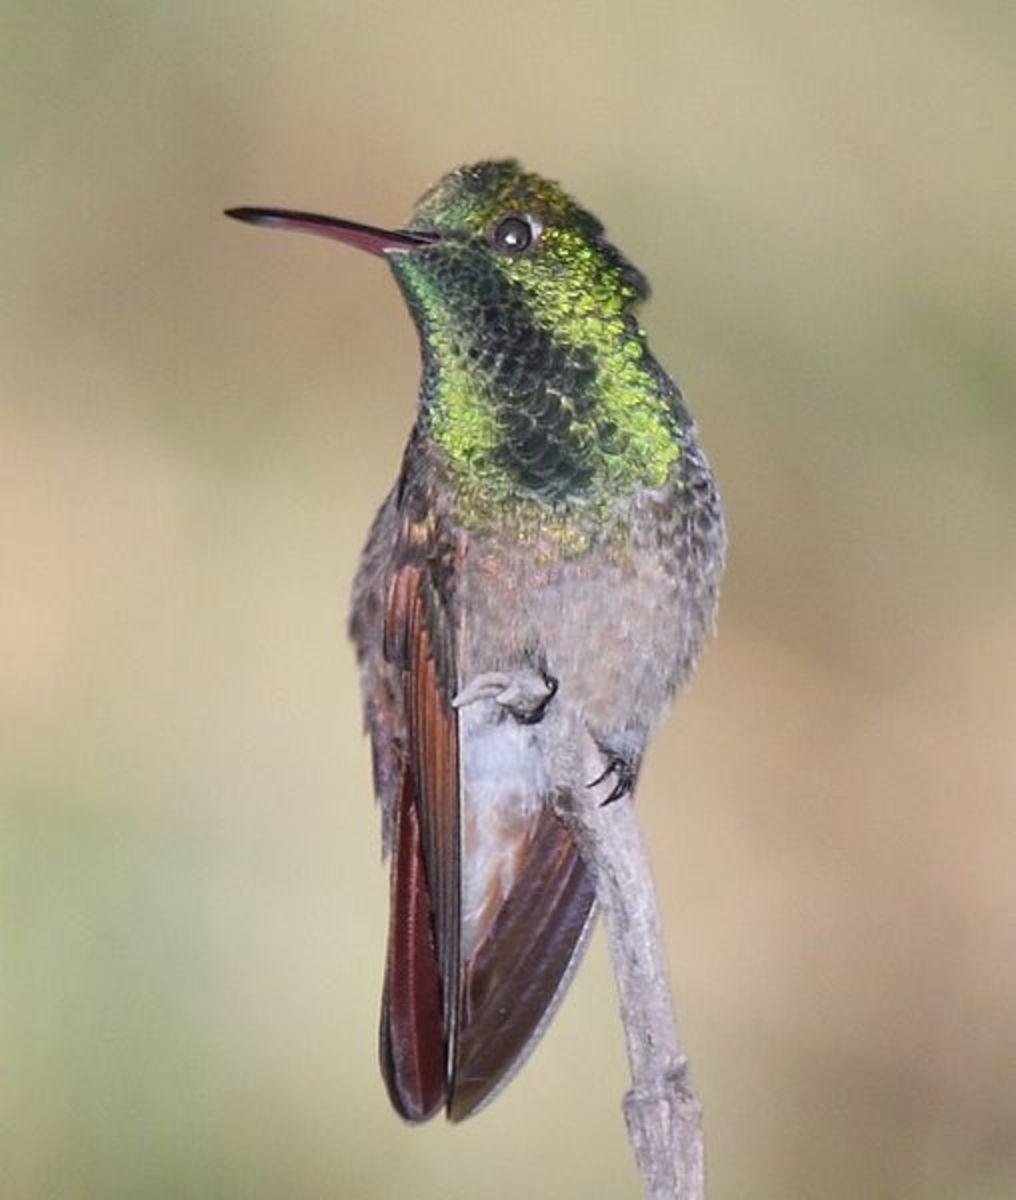 Different species of hummingbirds: Berylline hummingbird